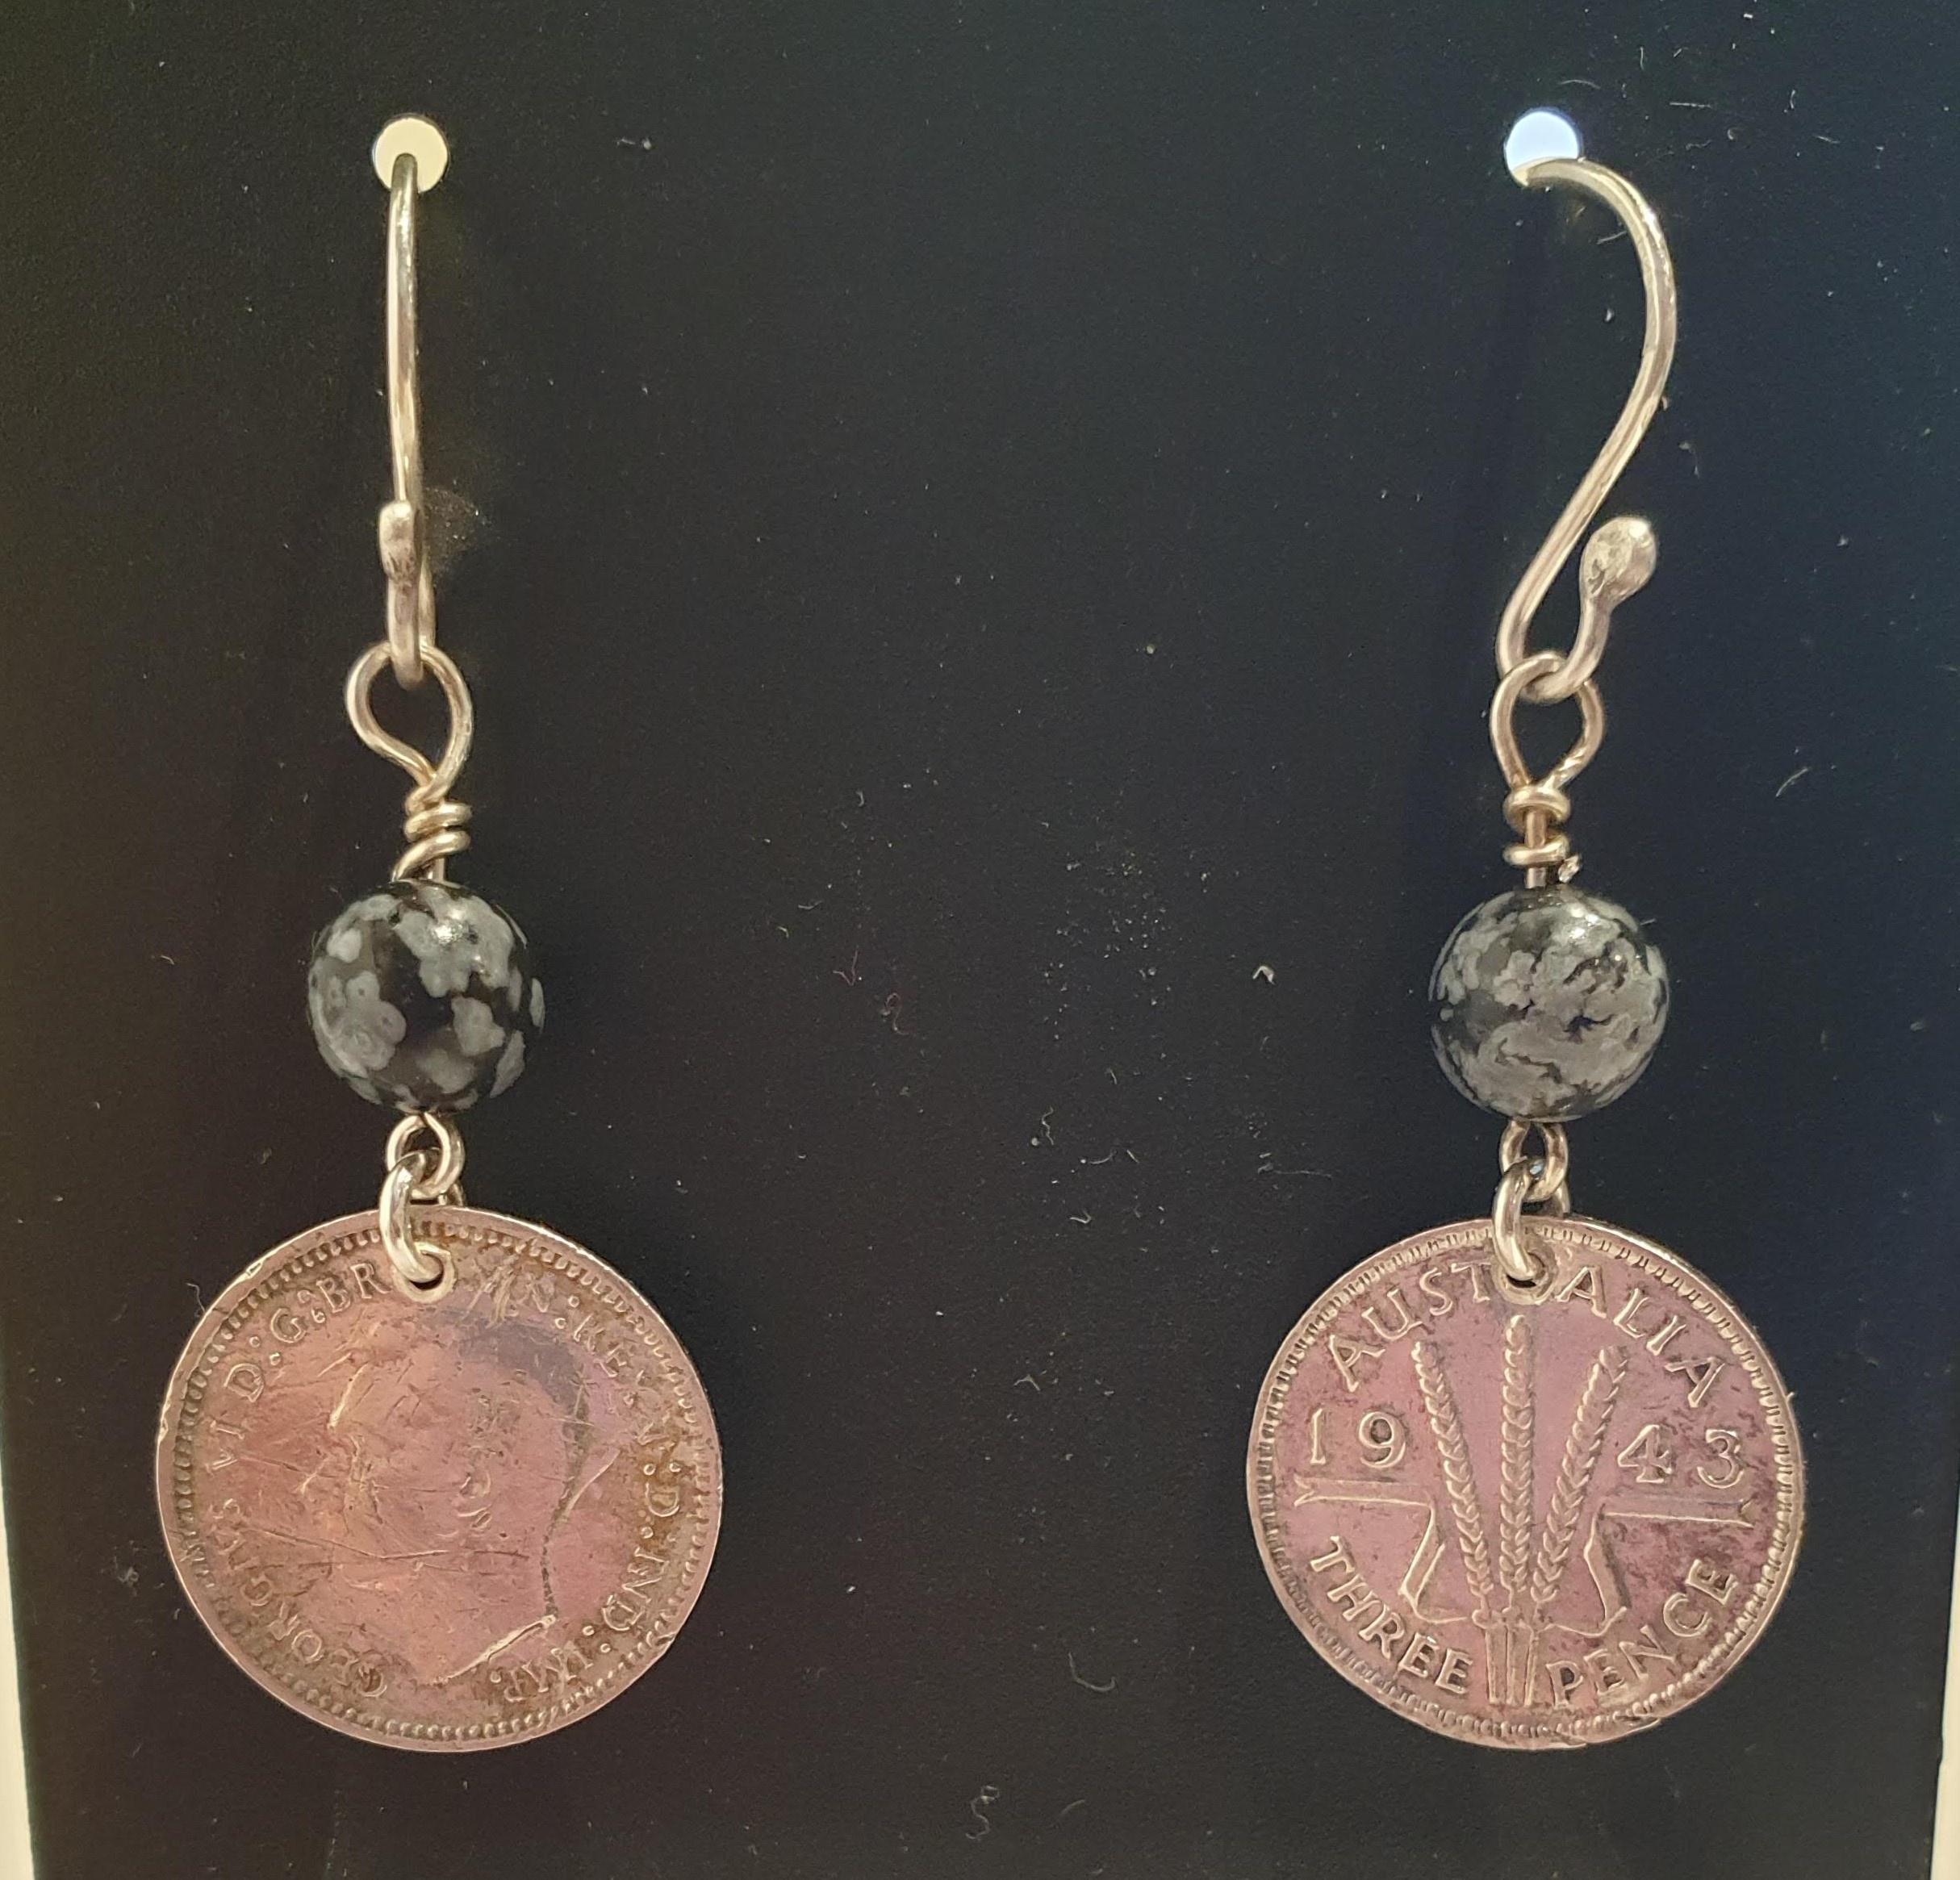 Genuine 1943 Threepence and Snowflake Obsidian Earrings